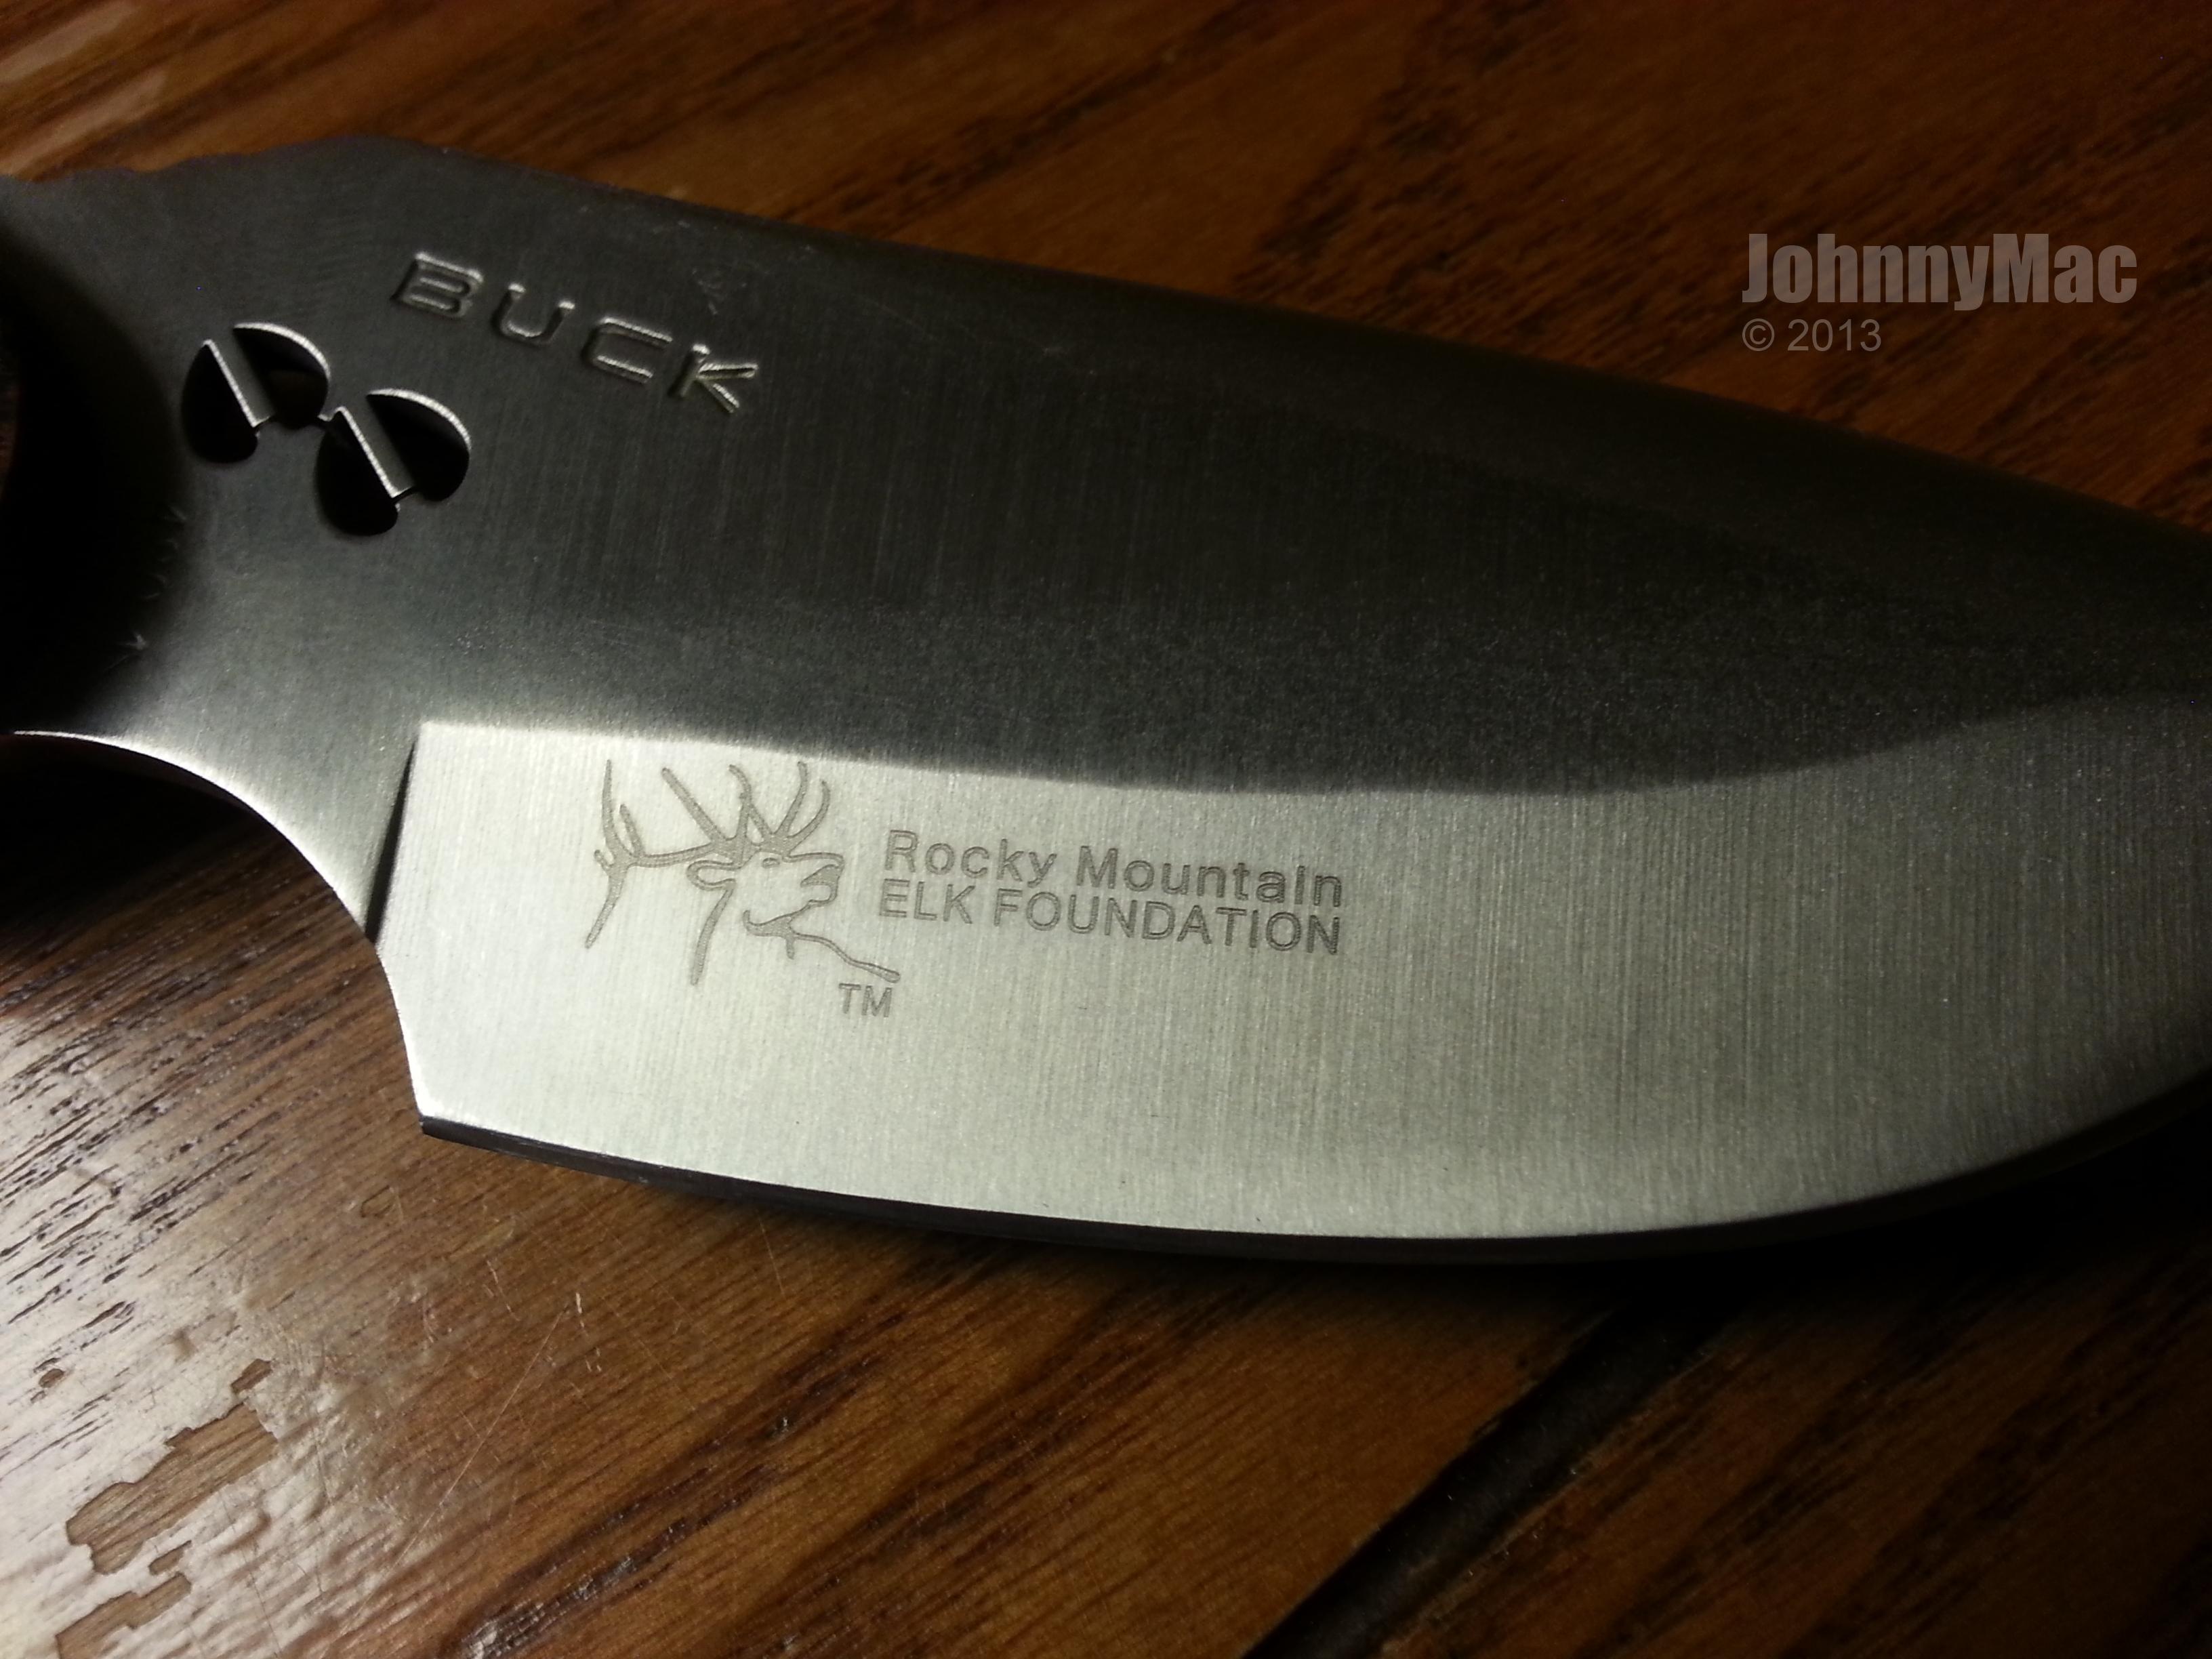 buck 480 fixed blade drop point knife johnny mac reviews